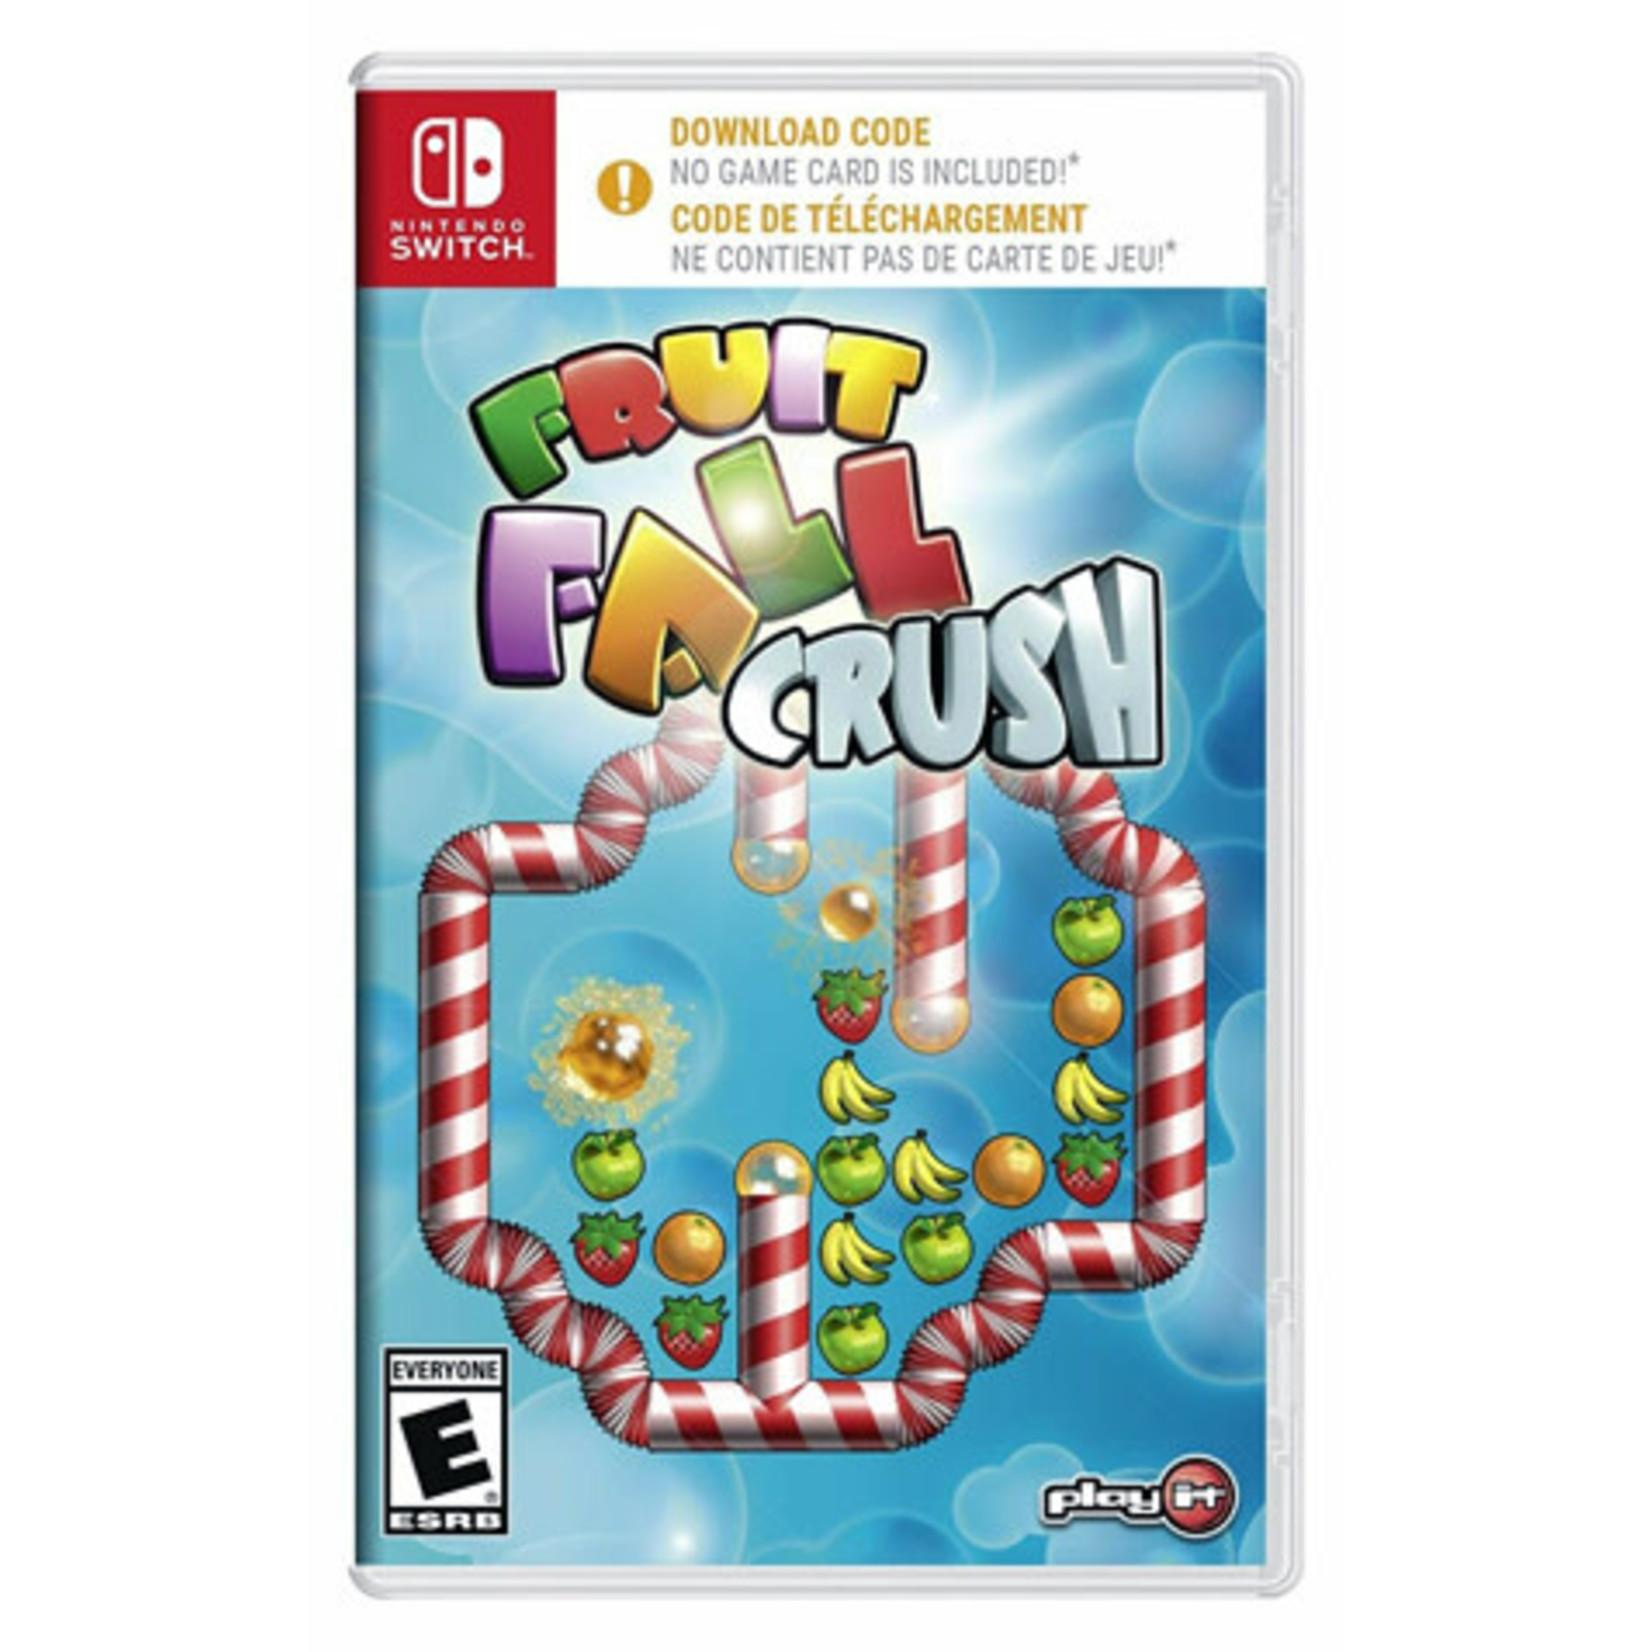 Switch-Fruit Fall Crush